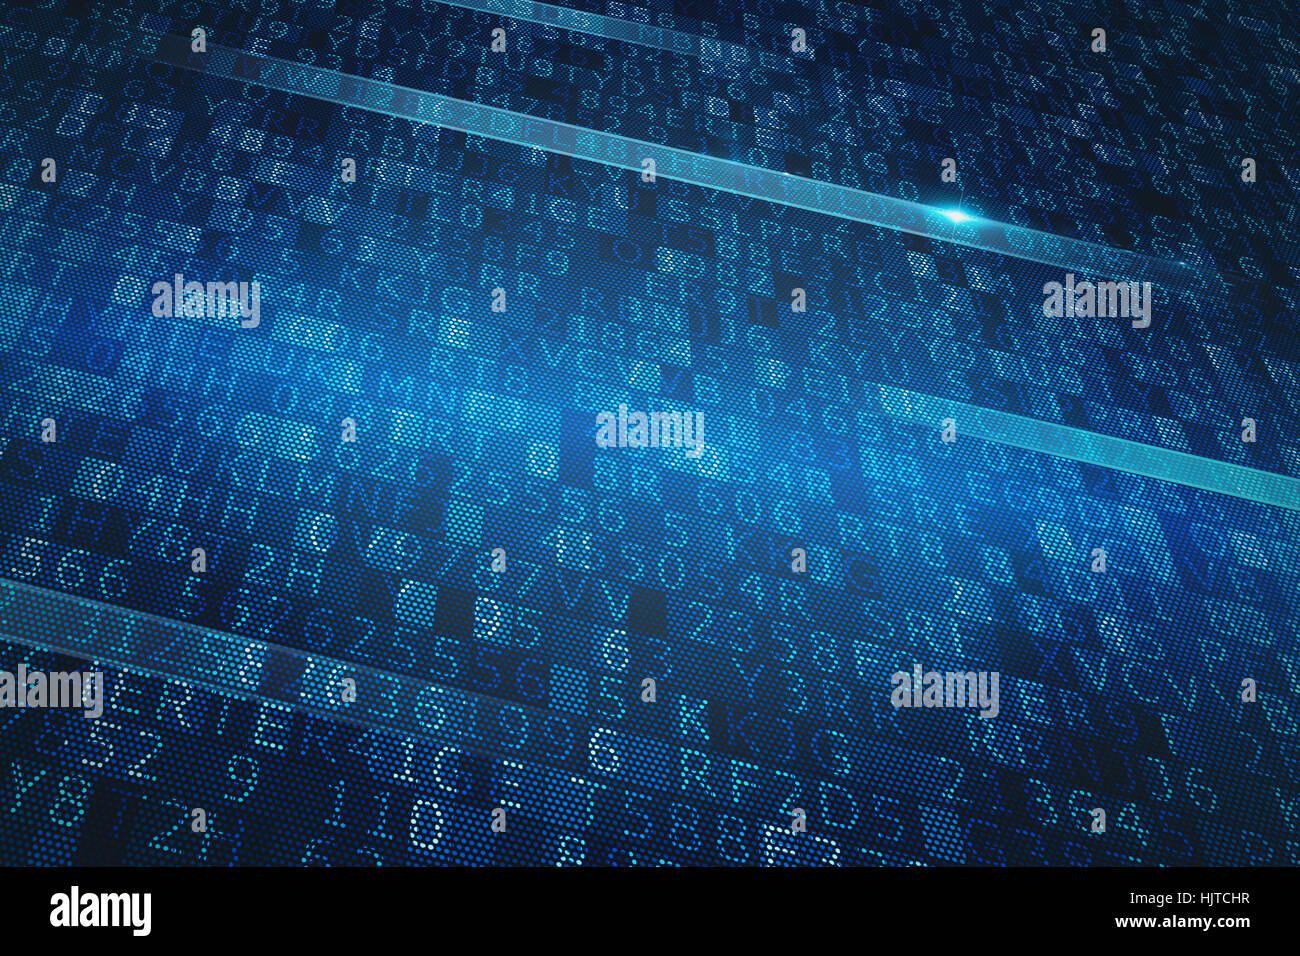 Digitalen Binärsystem Stockbild